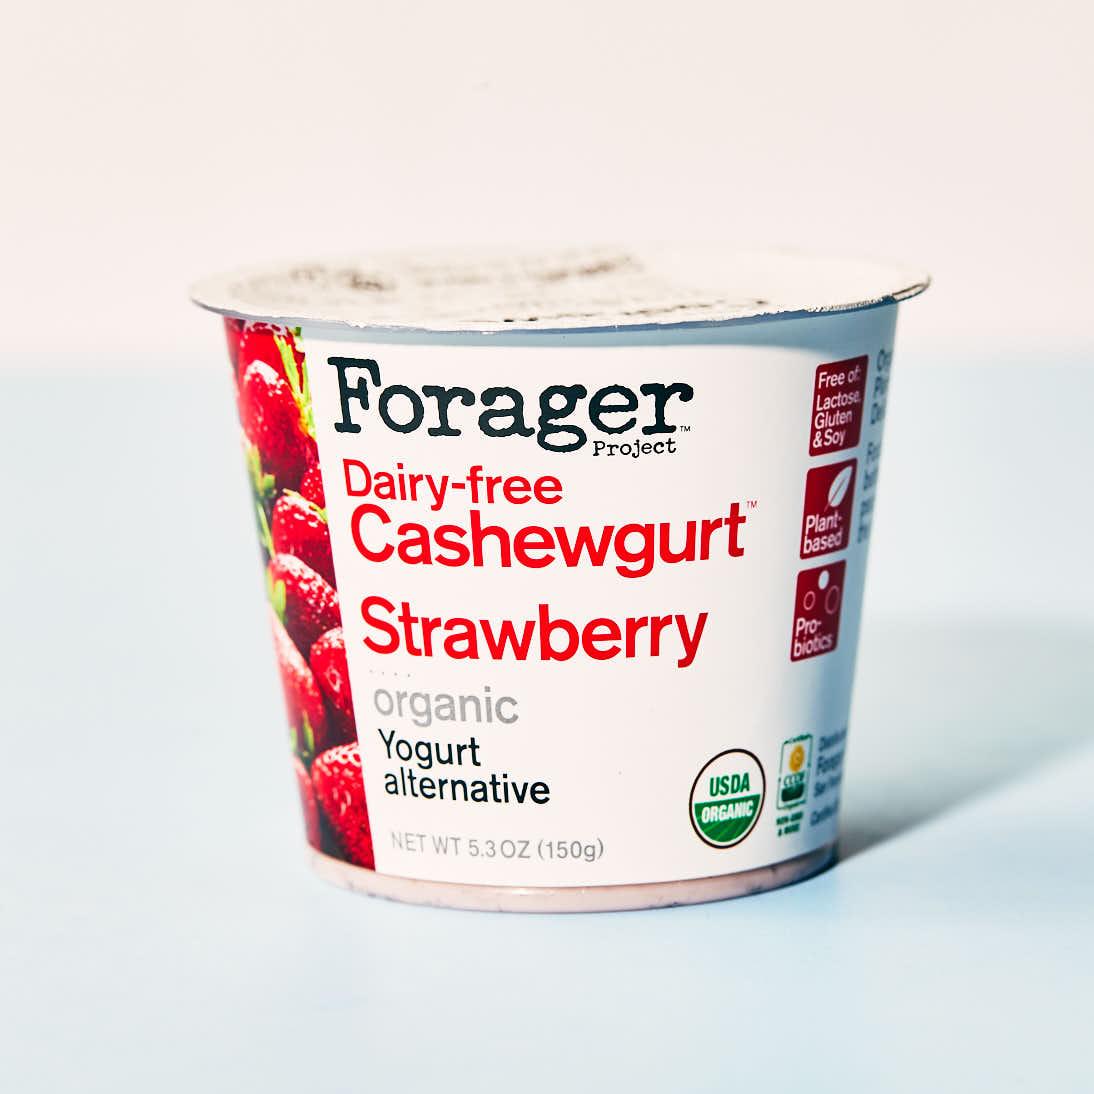 Forager Cashewgurt - Strawberry.jpg